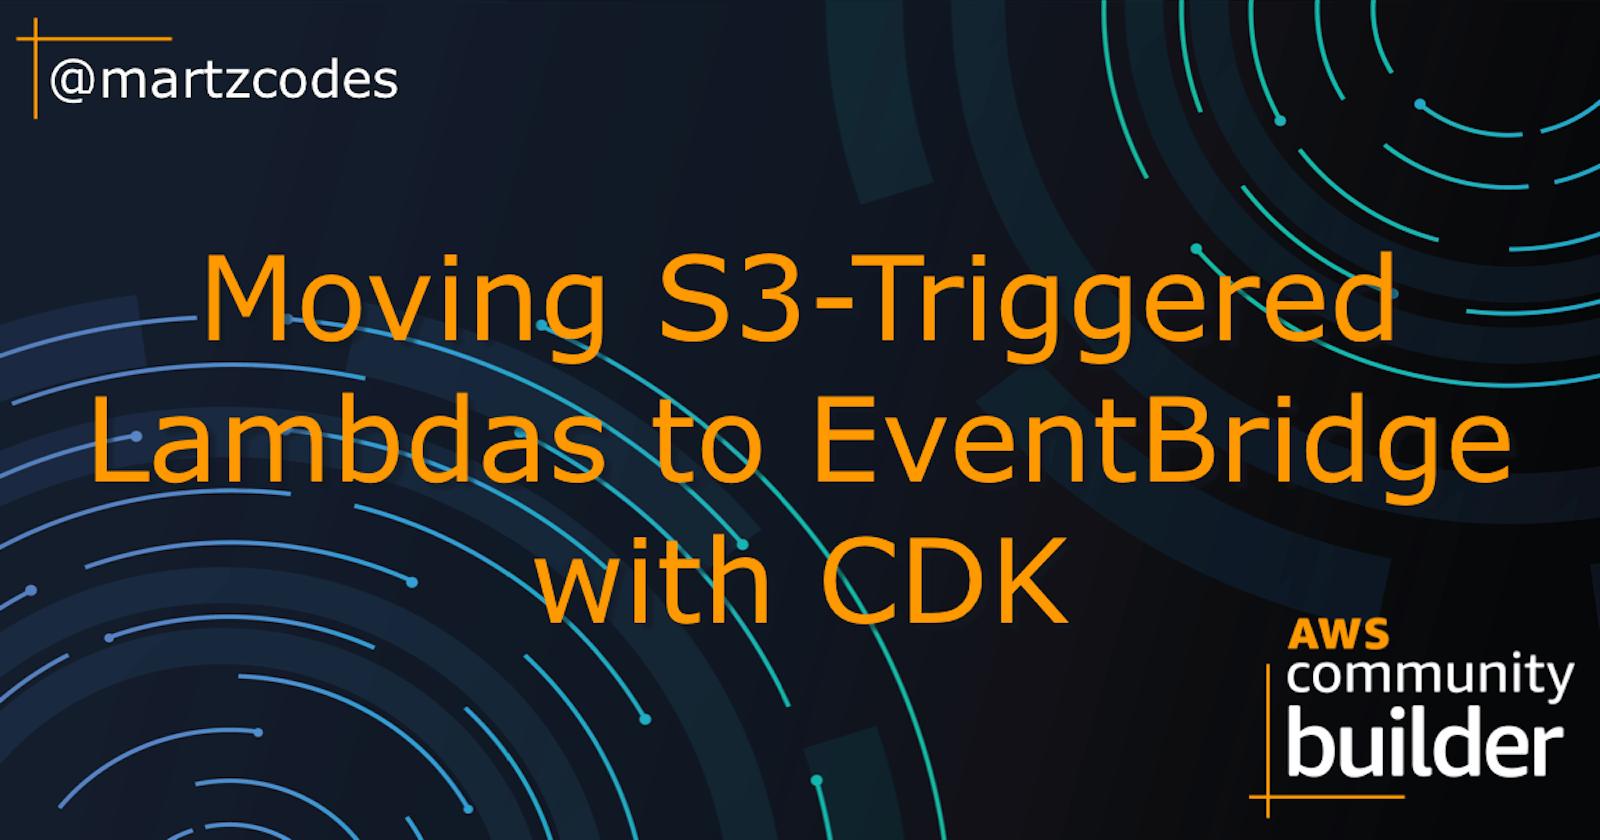 Moving S3-Triggered Lambdas to EventBridge with CDK